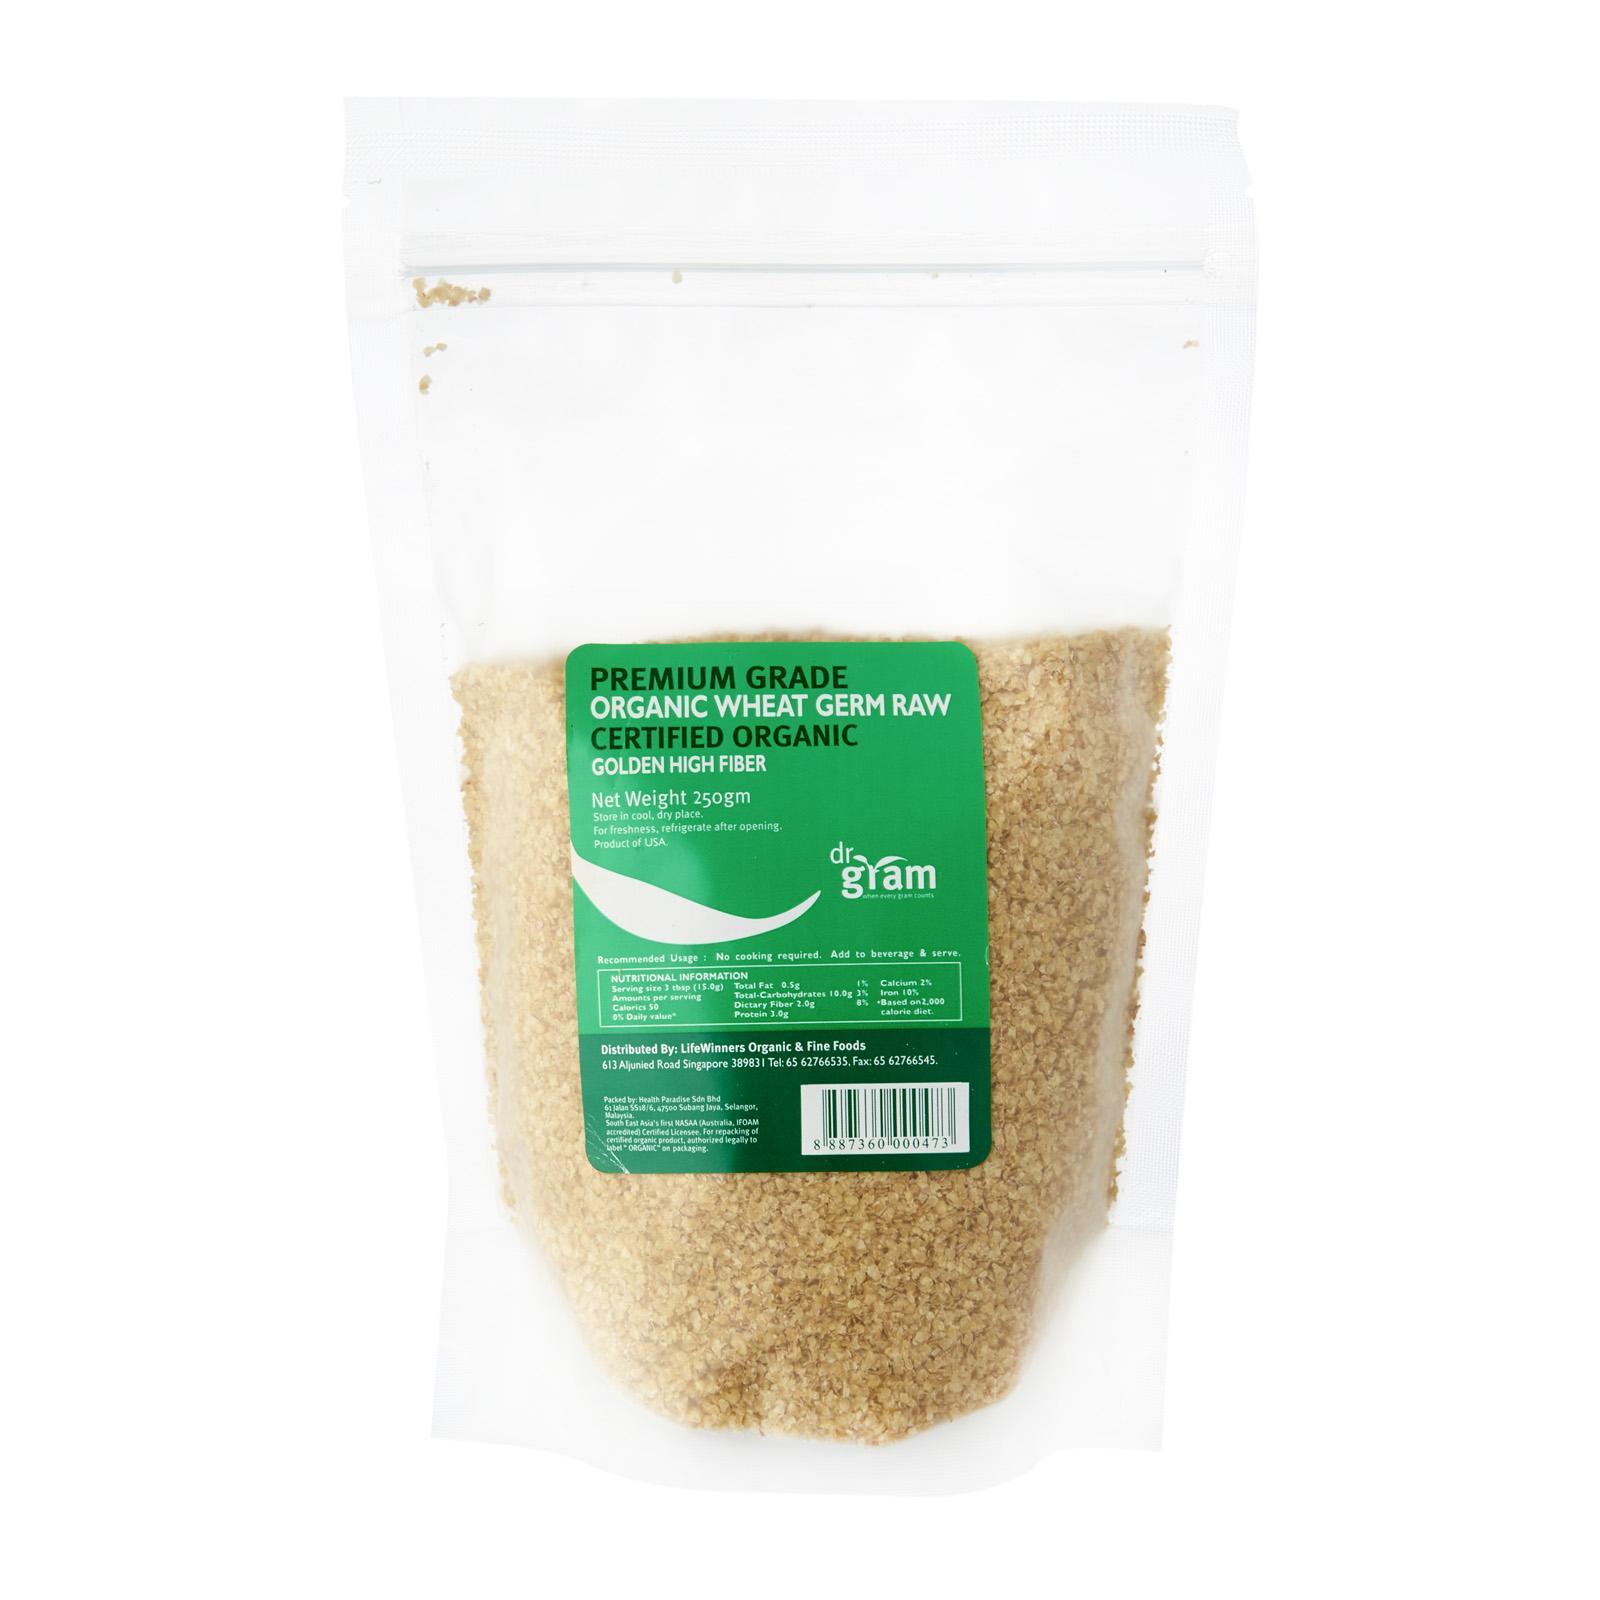 Dr Gram Organic Raw Wheat Germ 250g (4 Packets) By Lifewinners Organic & Fine Foods.